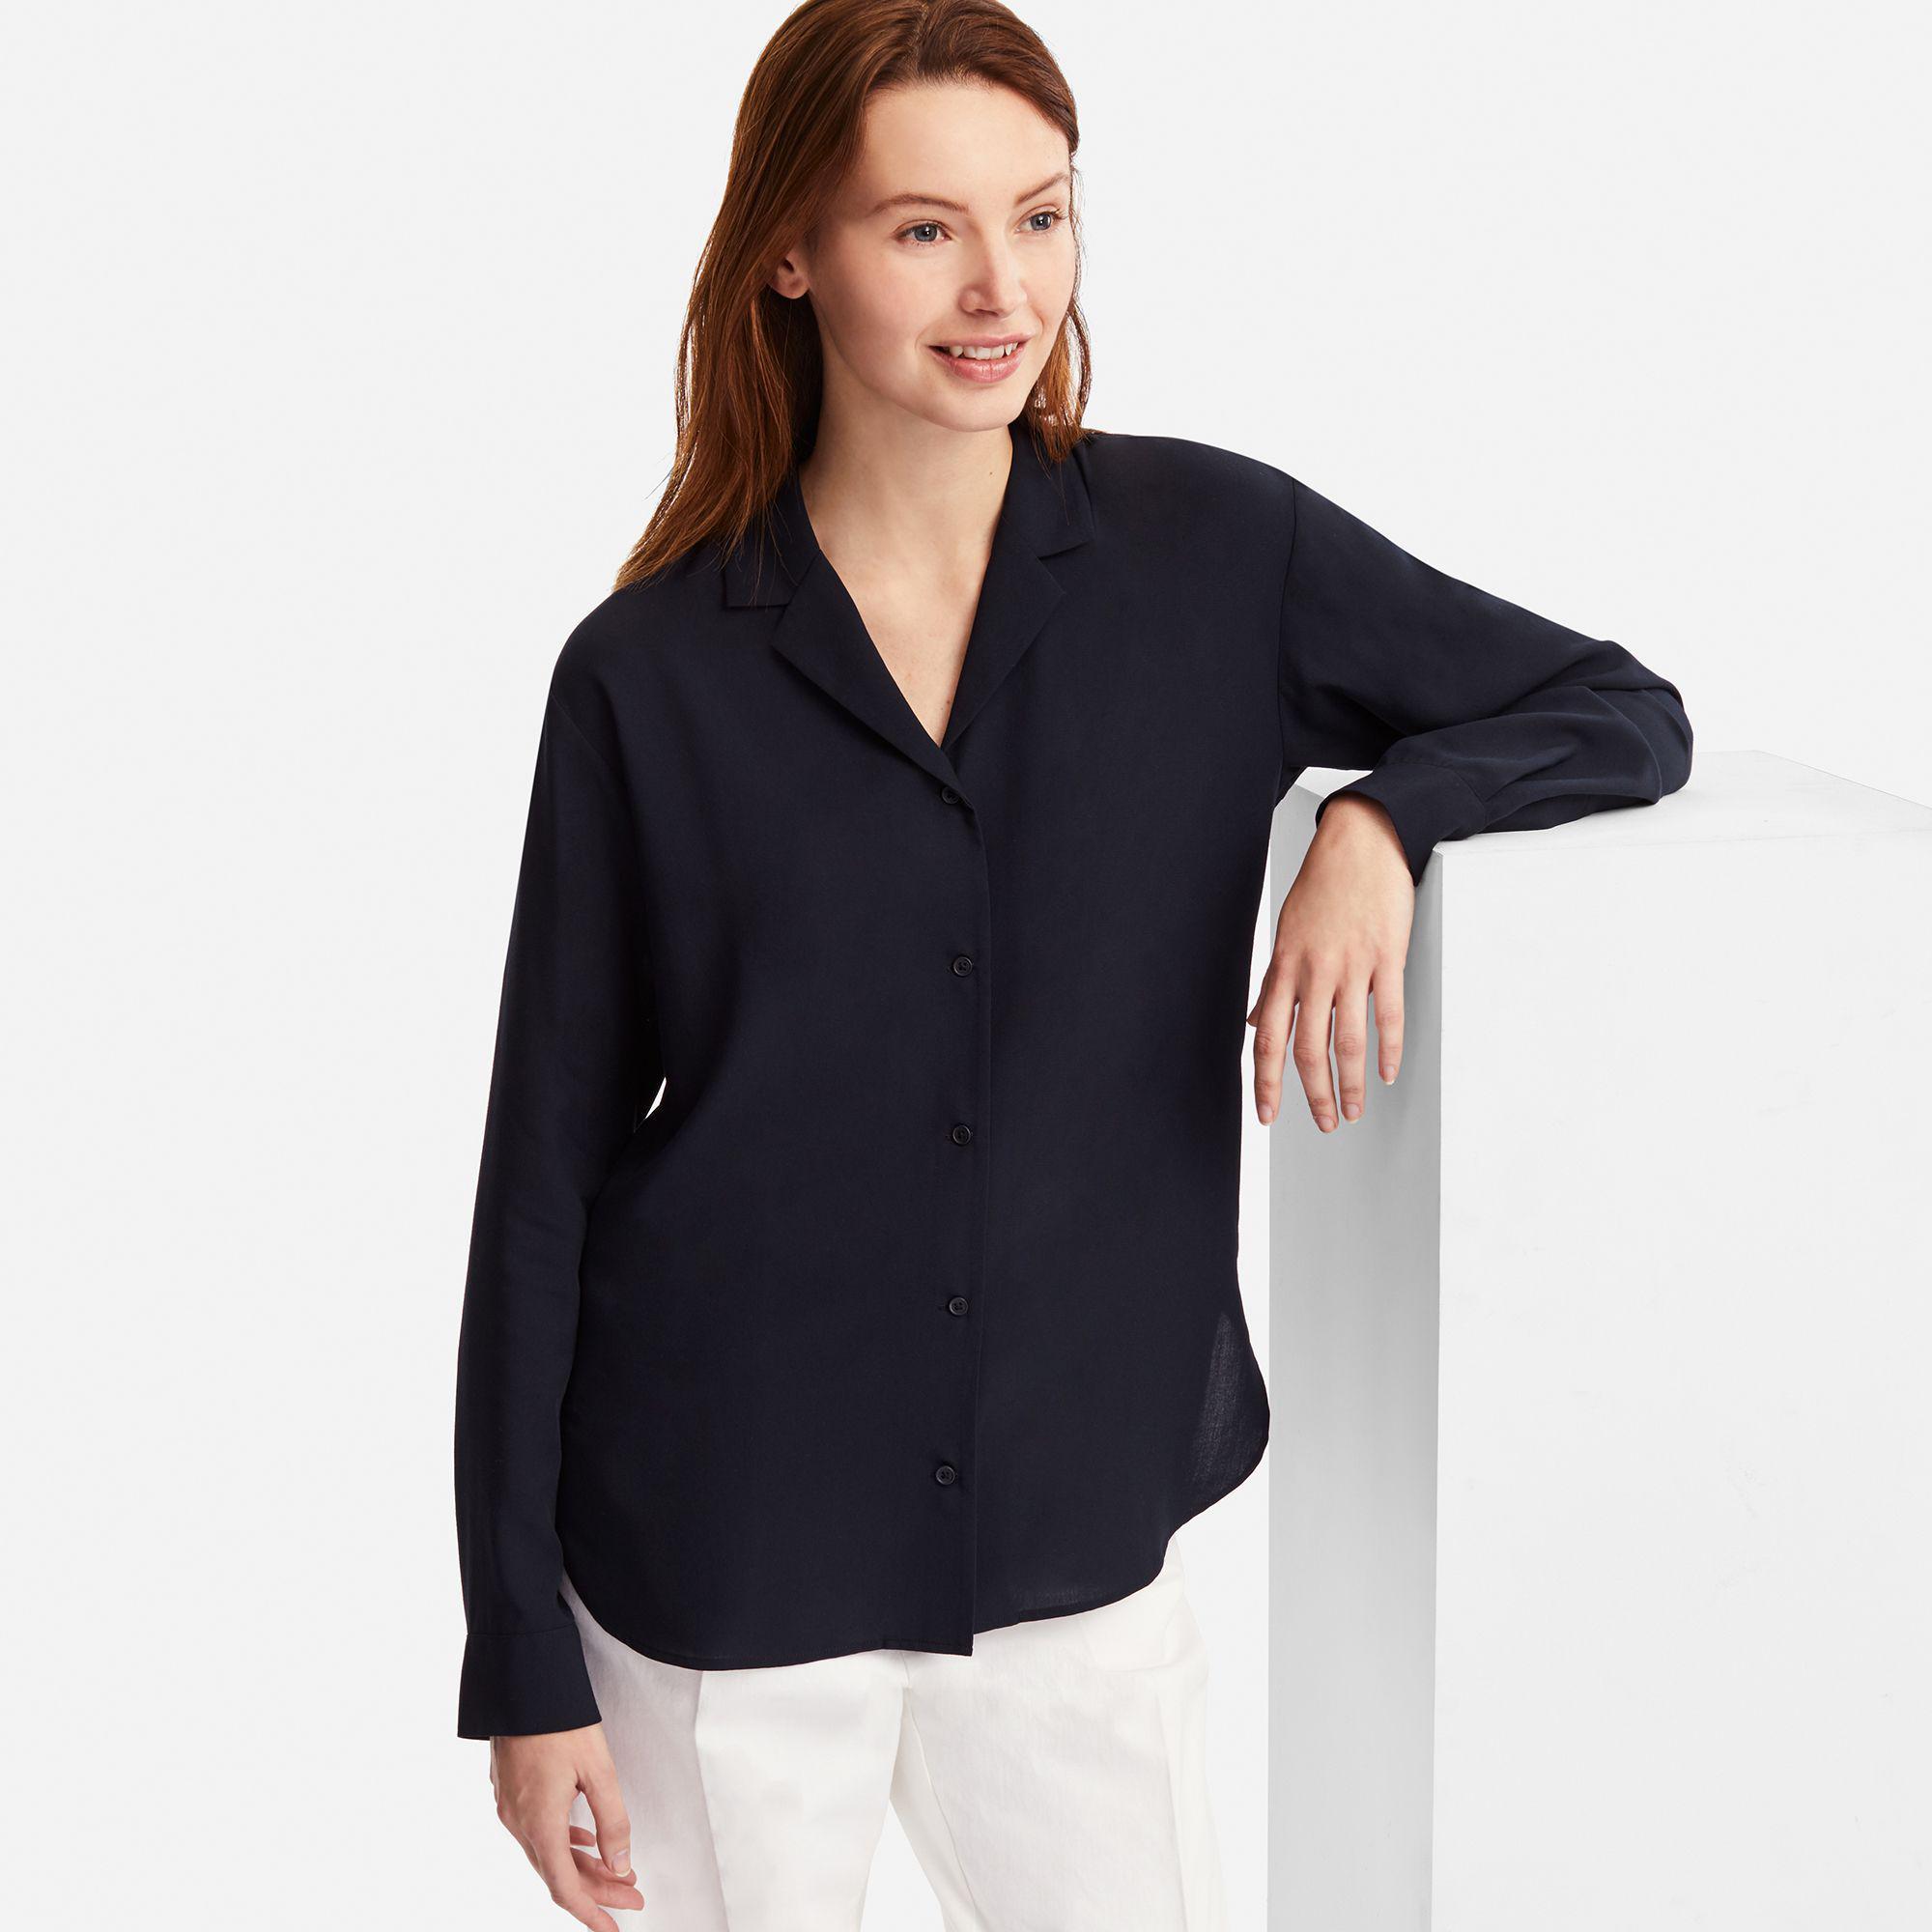 c29fa4999cabc Uniqlo Women Rayon Open Collar Long-sleeve Blouse in Blue - Lyst